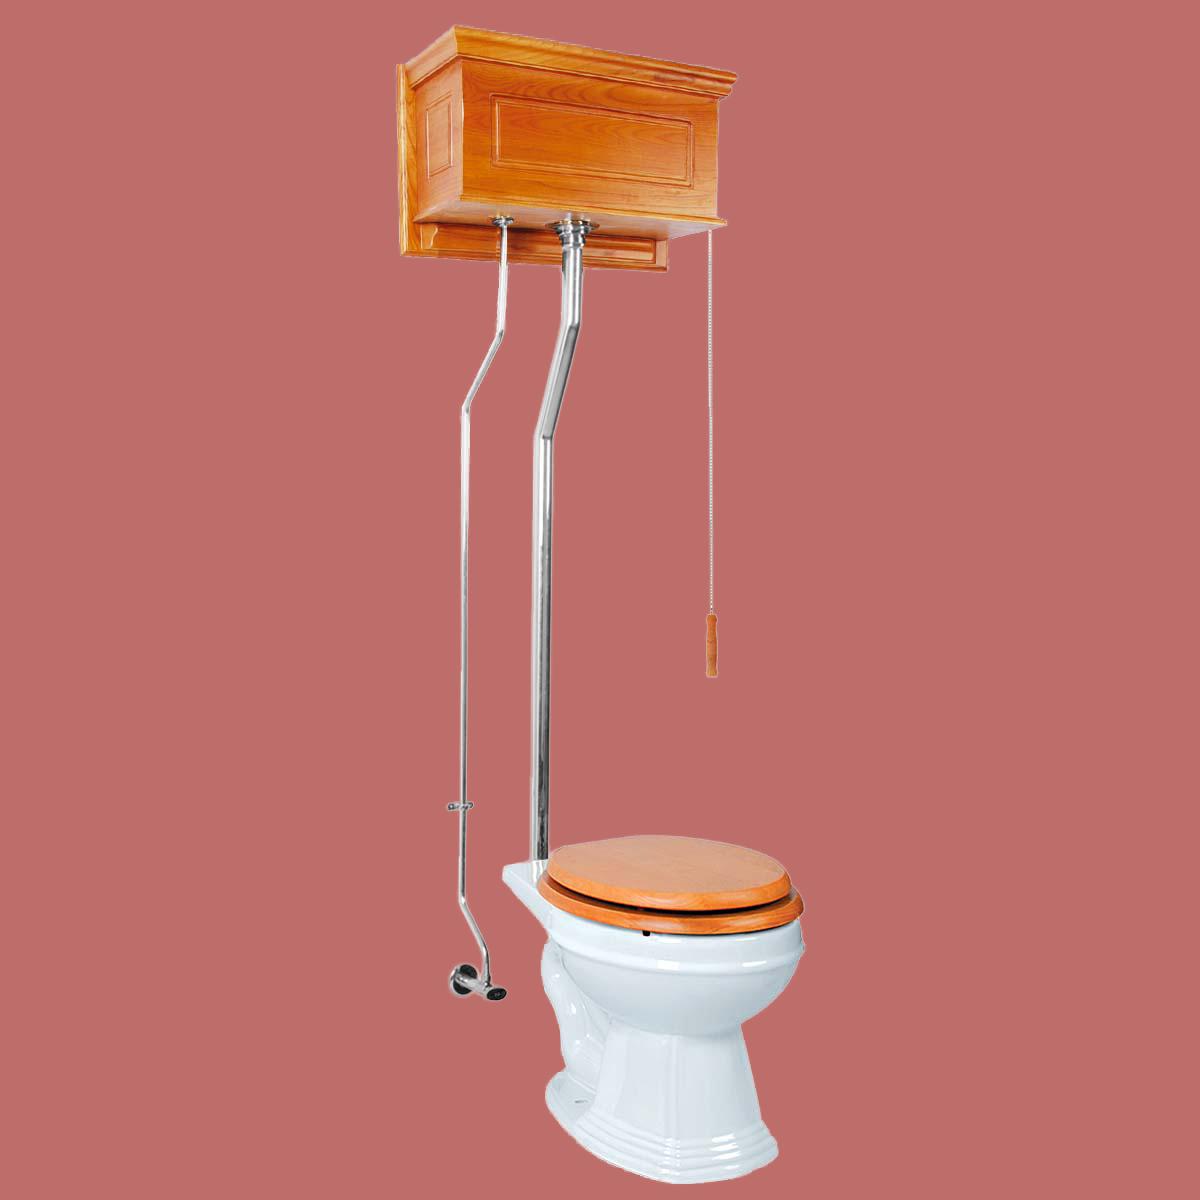 High Tank Pull Chain Toilet Round Light Oak Raised Chrome : 13027 from www.rensup.com size 1200 x 1200 jpeg 130kB